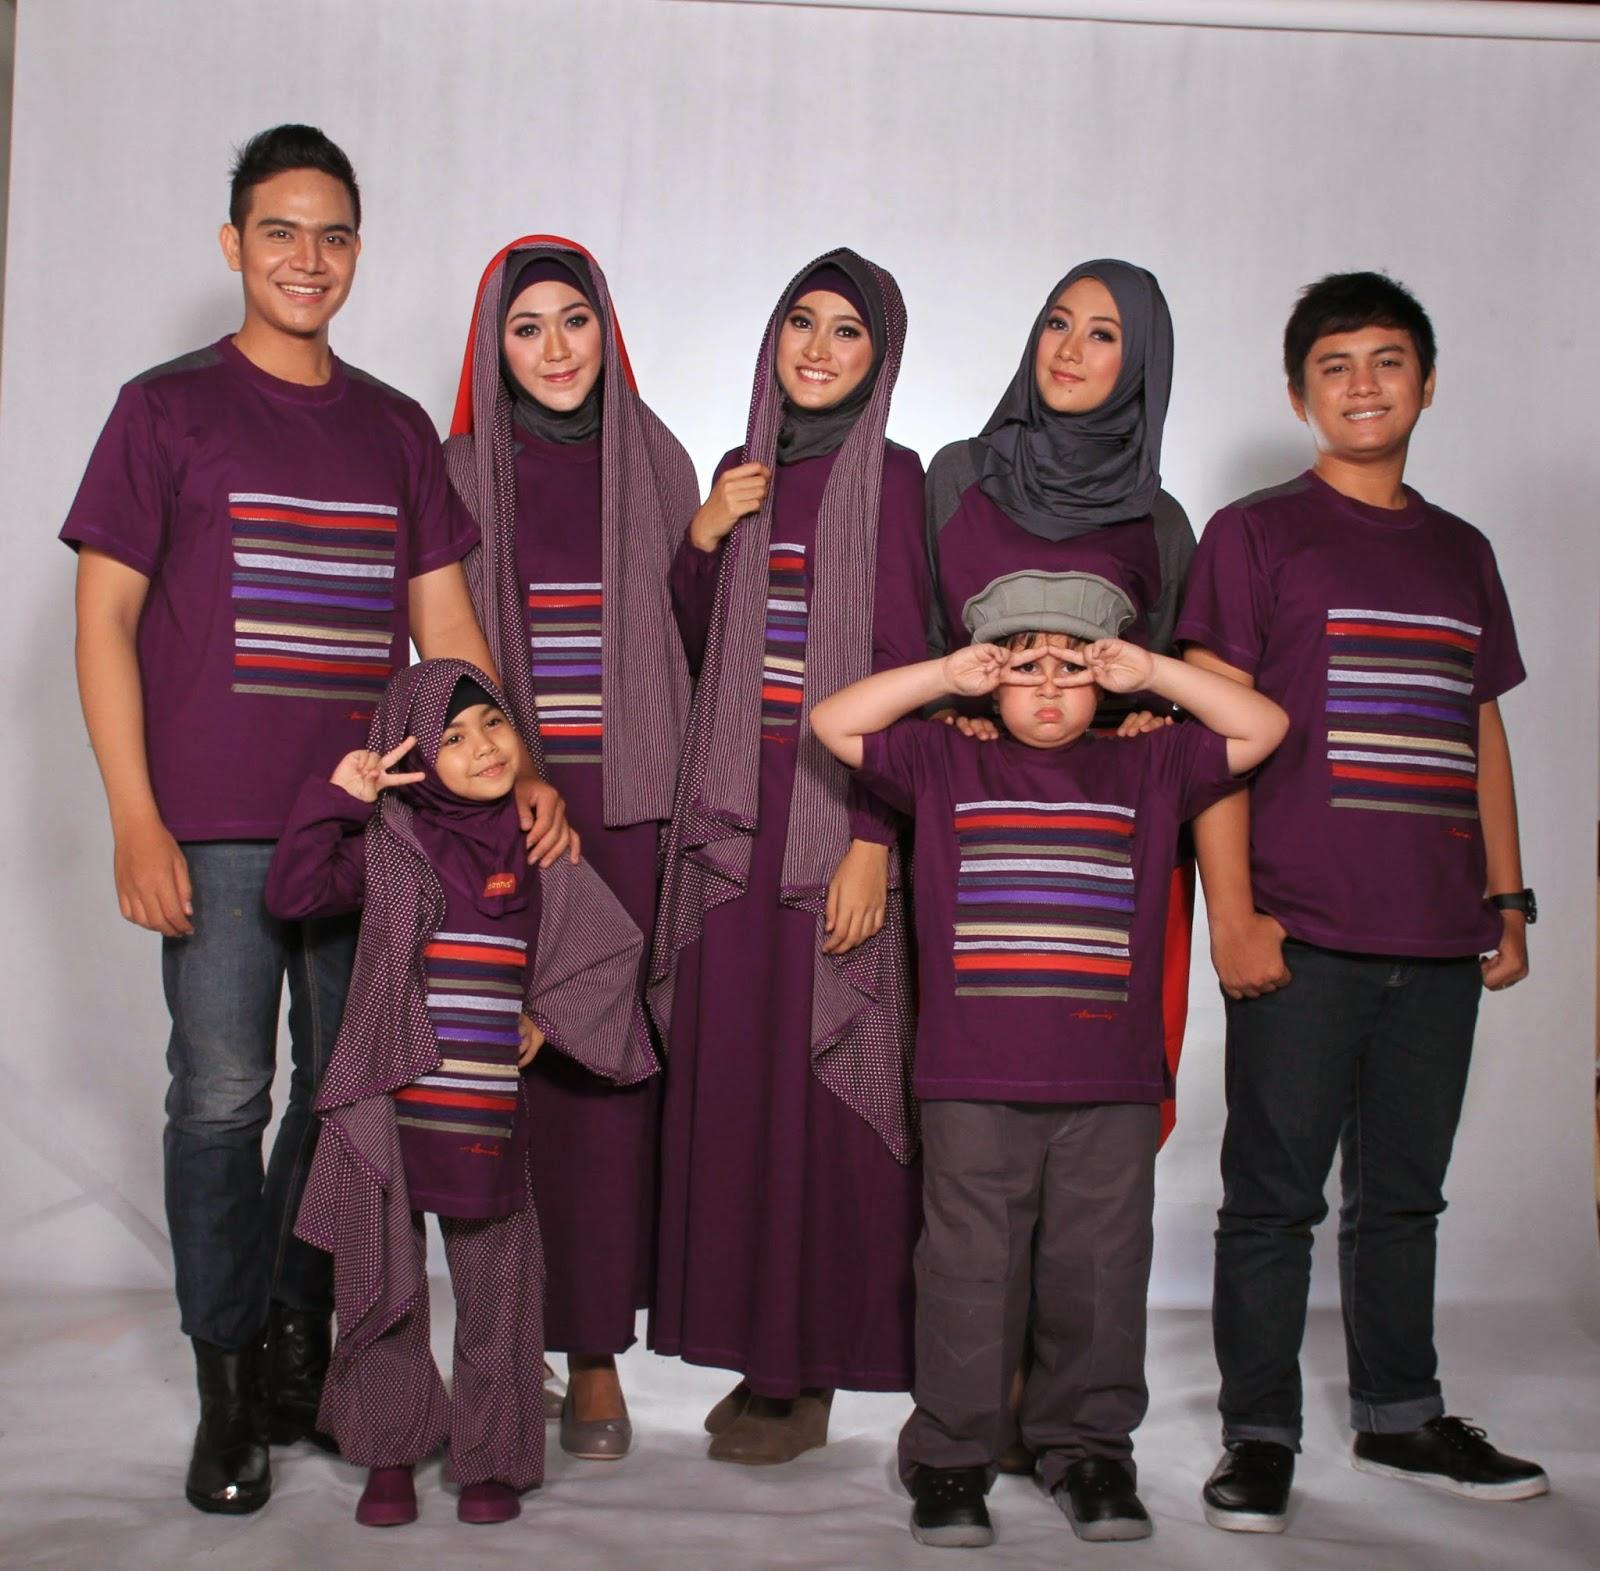 25 model baju lebaran keluarga 2018 kompak modis Model baju gamis couple keluarga